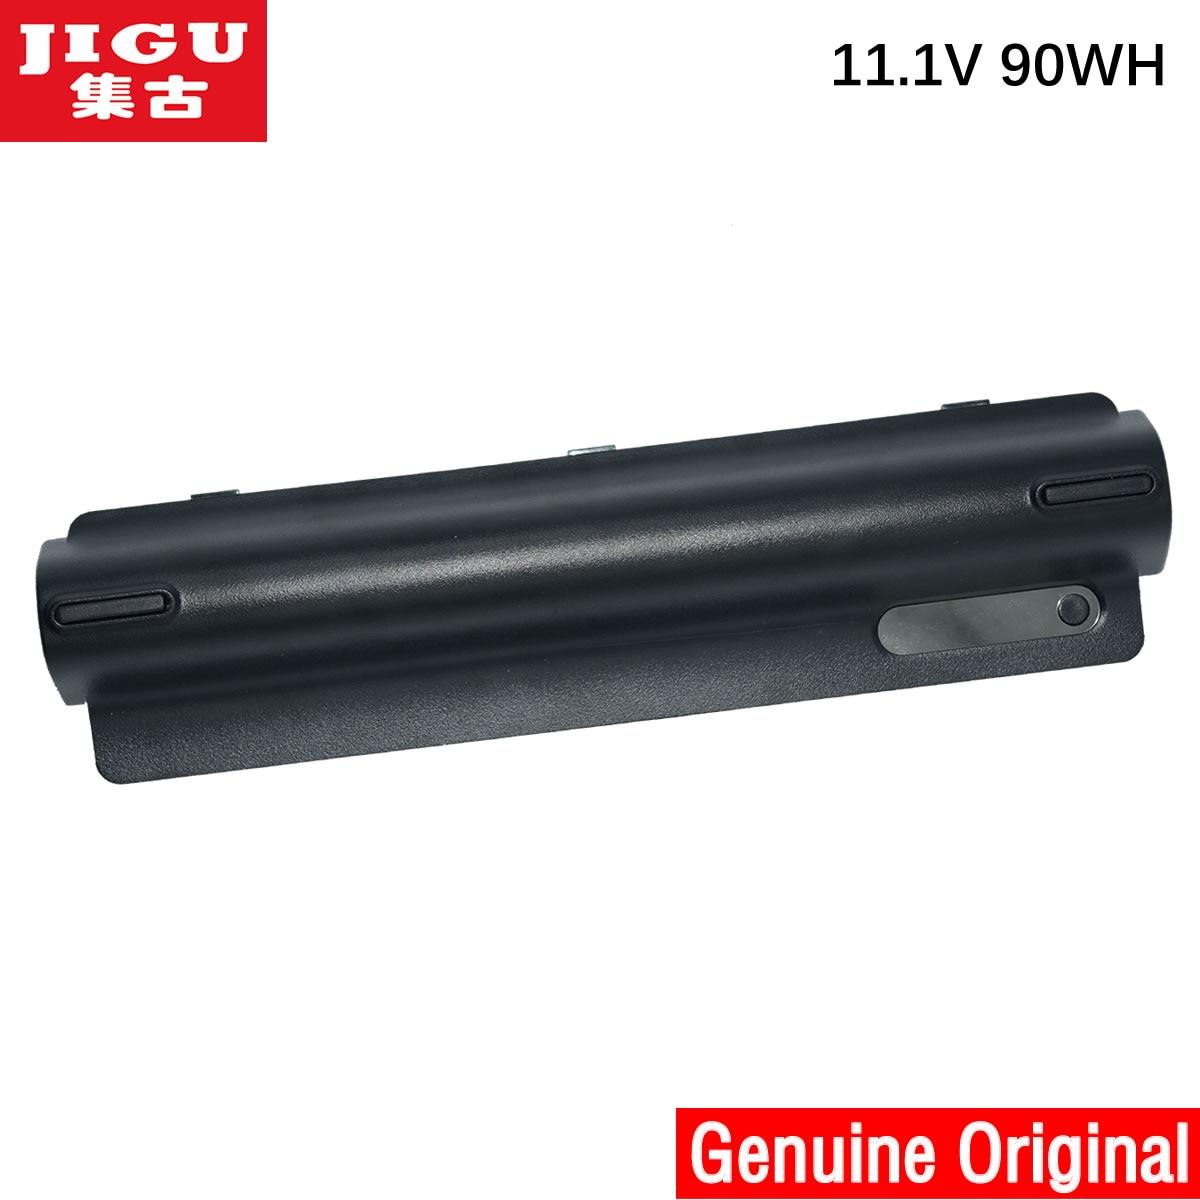 JIGU 312-1123 J70W7 R795X WHXY3 Original laptop <font><b>Battery</b></font> For Dell XPS14 XPS15 L402x L501x L502x L701x <font><b>L702x</b></font> 11.1V 90WH